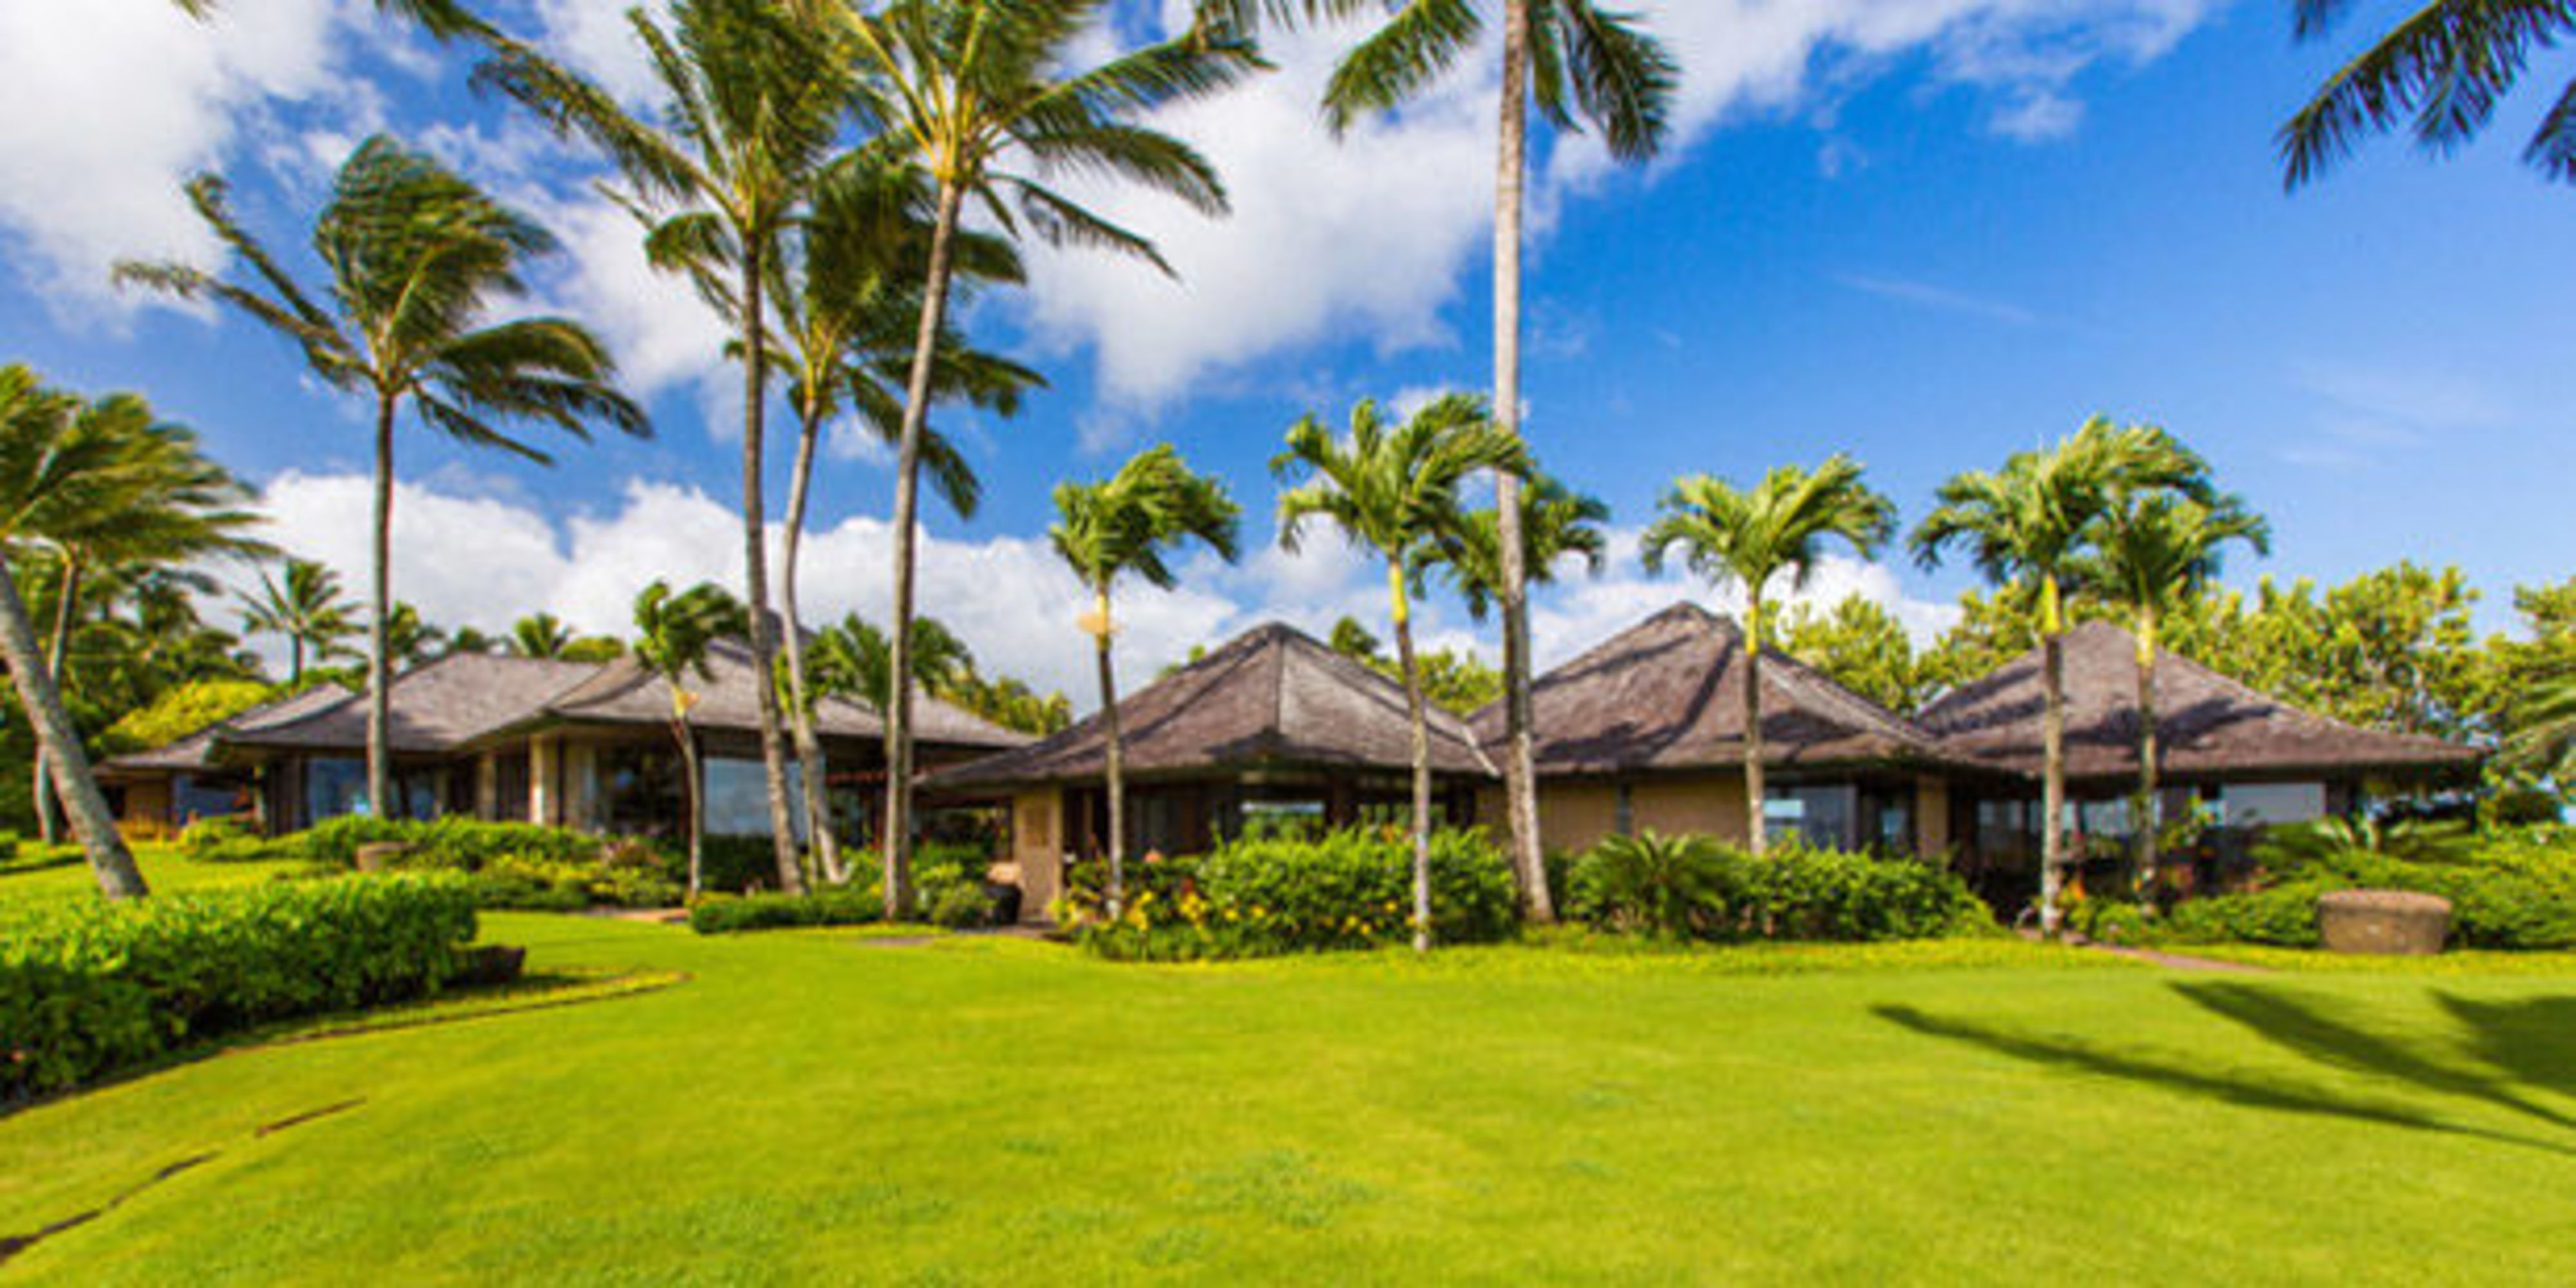 Say Aloha To The Most Expensive House In Hawaii Verandacom